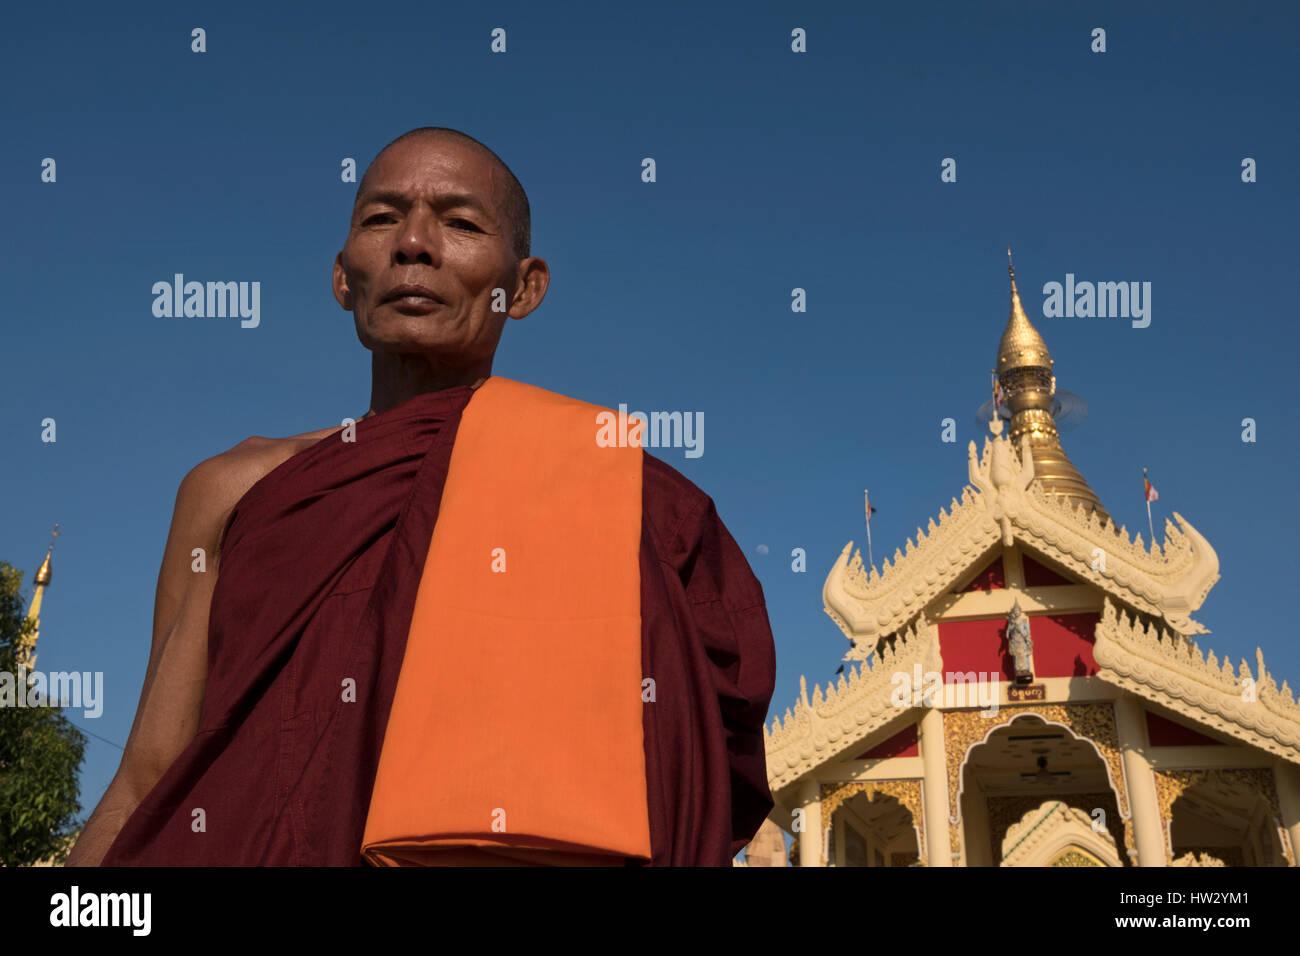 A Buddhist monk at the entrance of the Maha Wizaya Pagoda in Yangon, Yangon Region, Myanmar - Stock Image